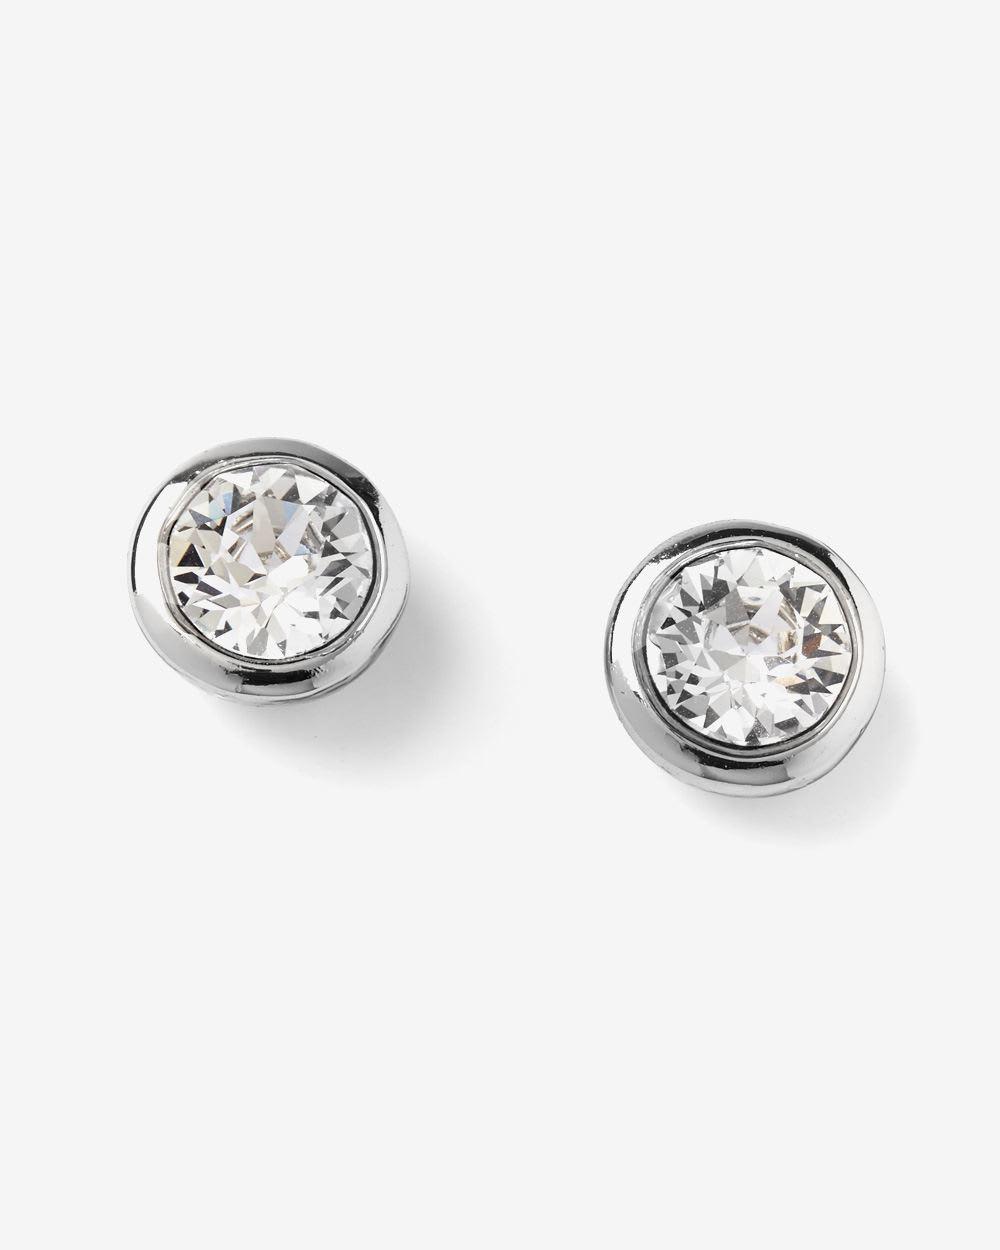 Swarovski Element Stud Earrings